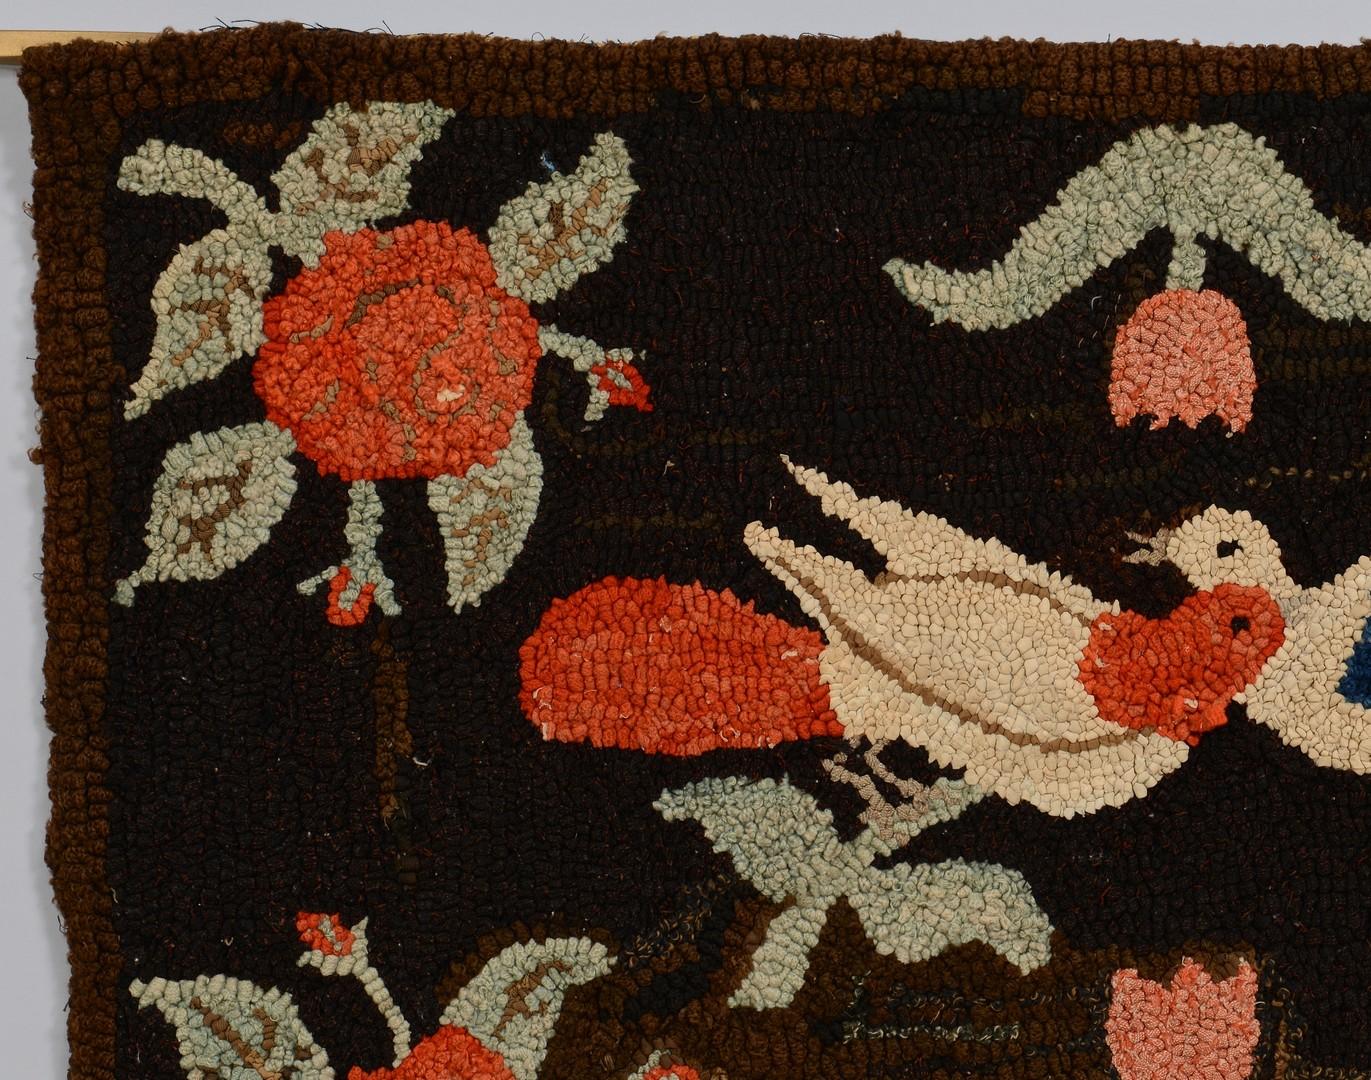 Lot 155: 2 Folk Art Textile Items, Hooked Rug & Sampler